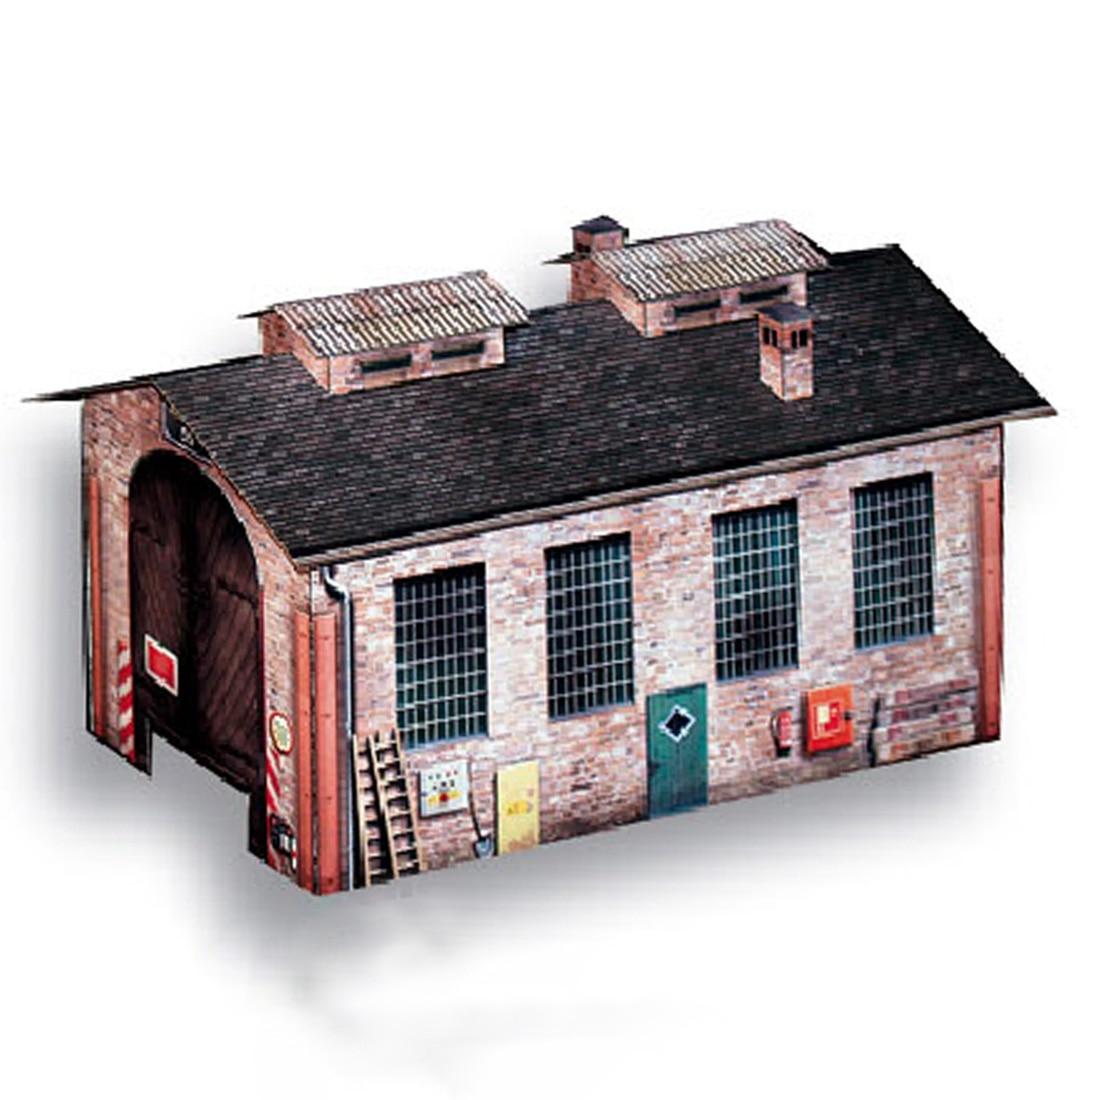 1:87 HO Scale Handmade Warehouse House Paper Model Sand Table Warehouse Model  Ho Scale Model Accessories